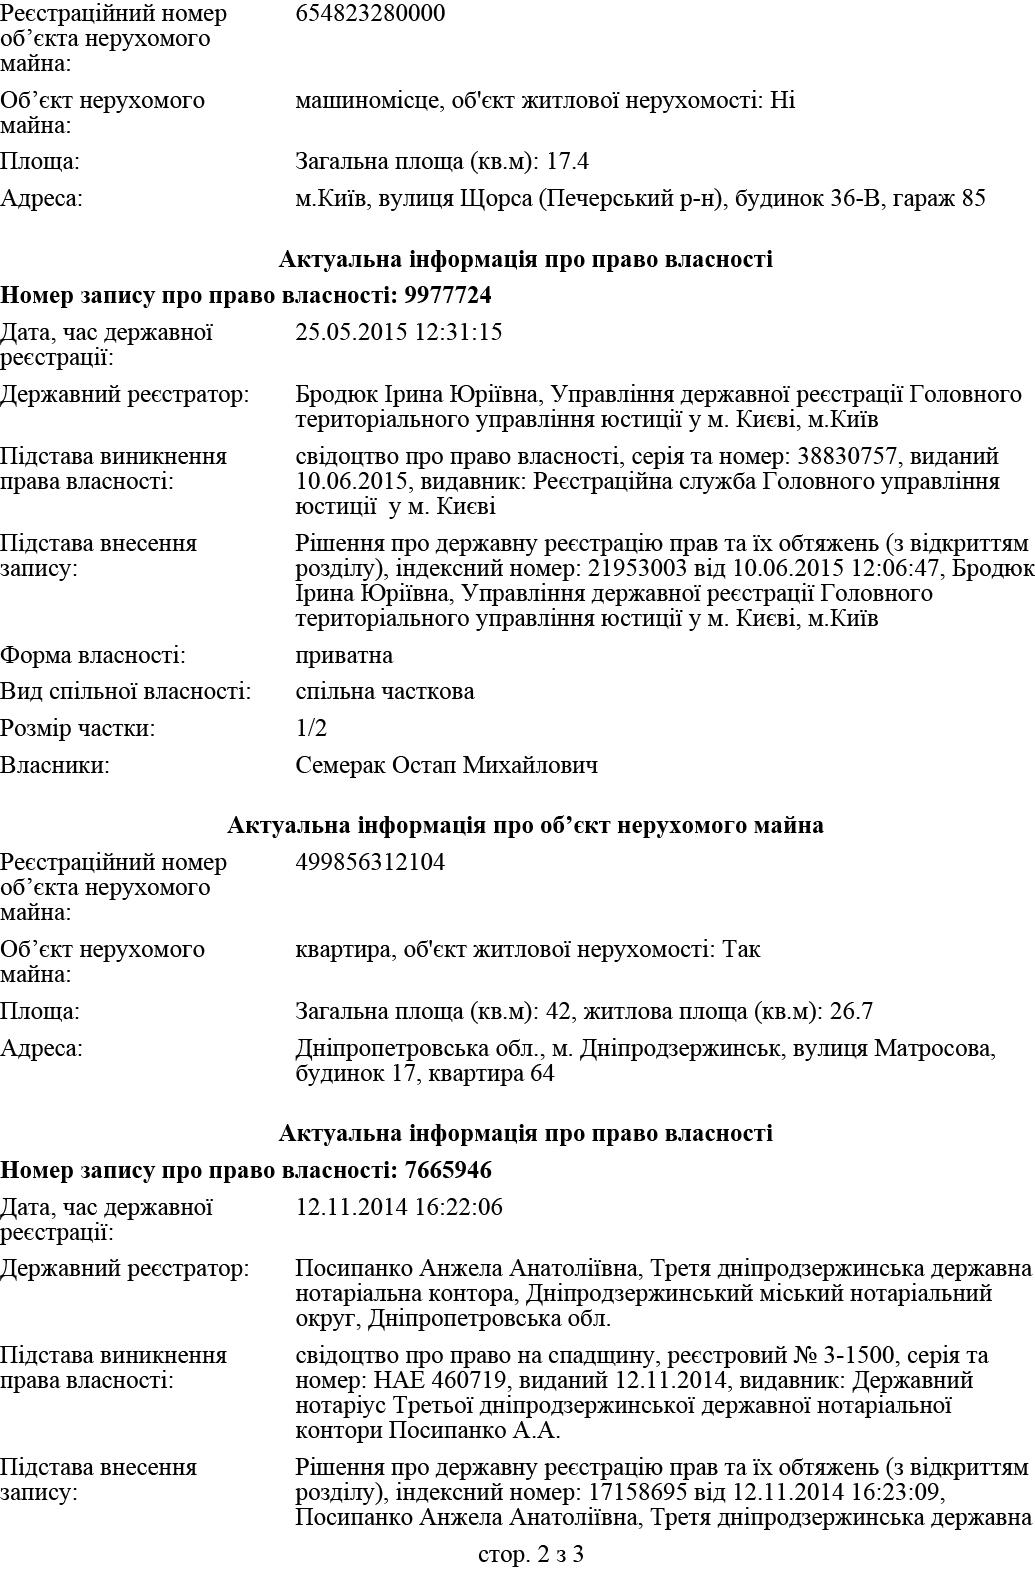 InformDovidka (1)_2